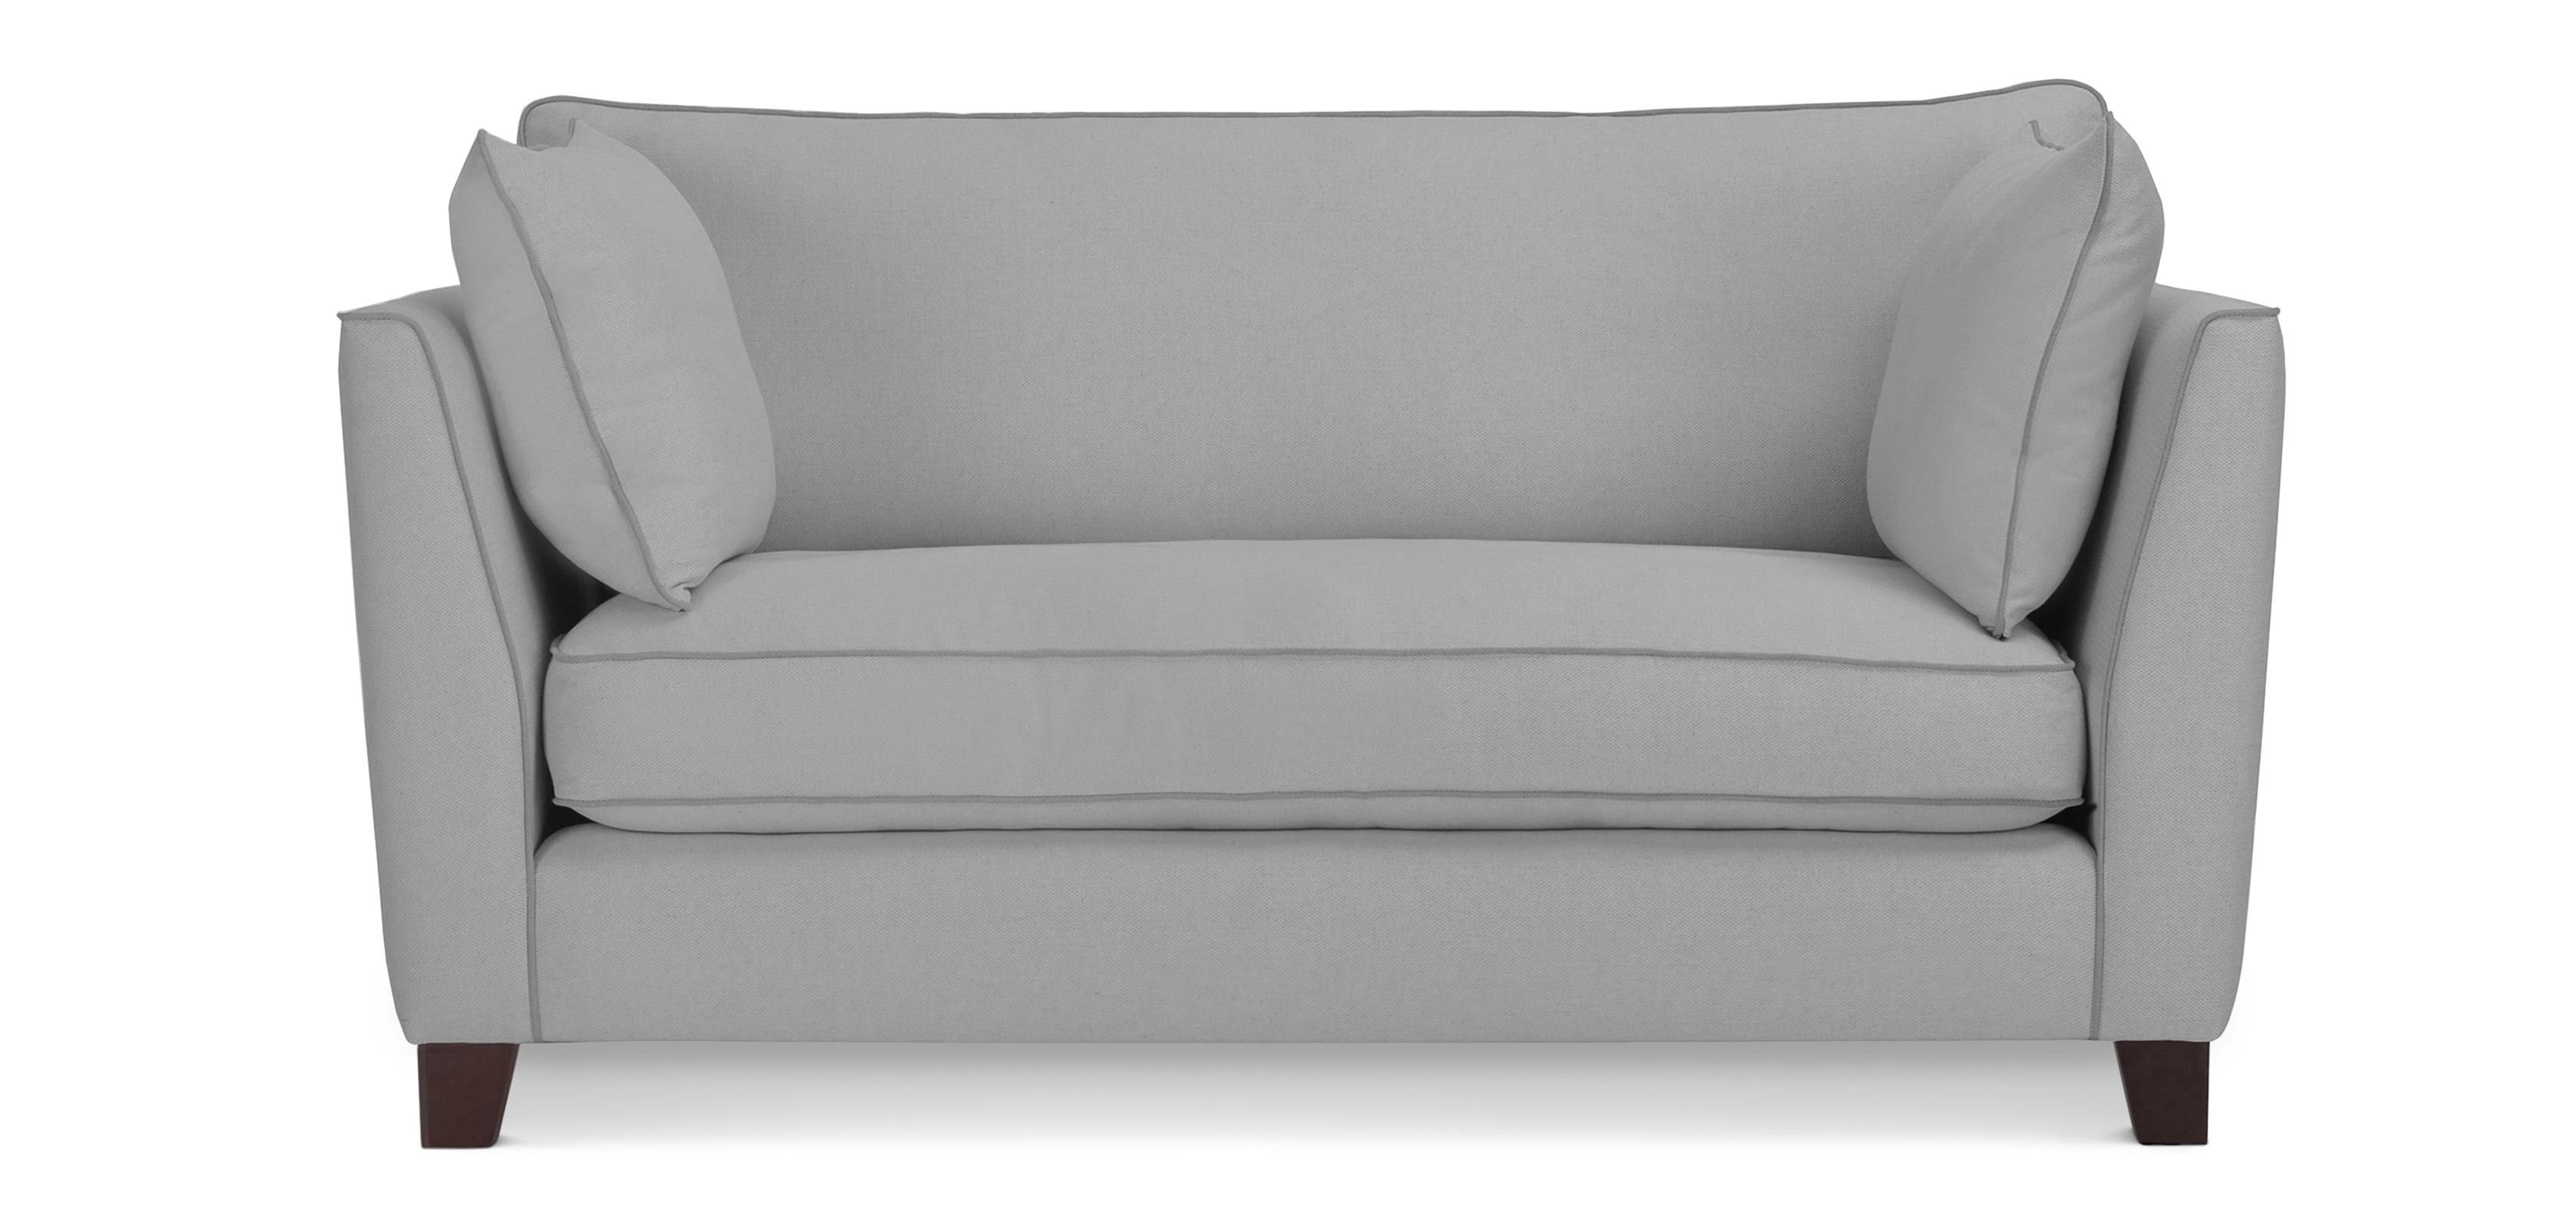 Sof de dise o escandinavo 2 asientos tela - Sofa escandinavo ...